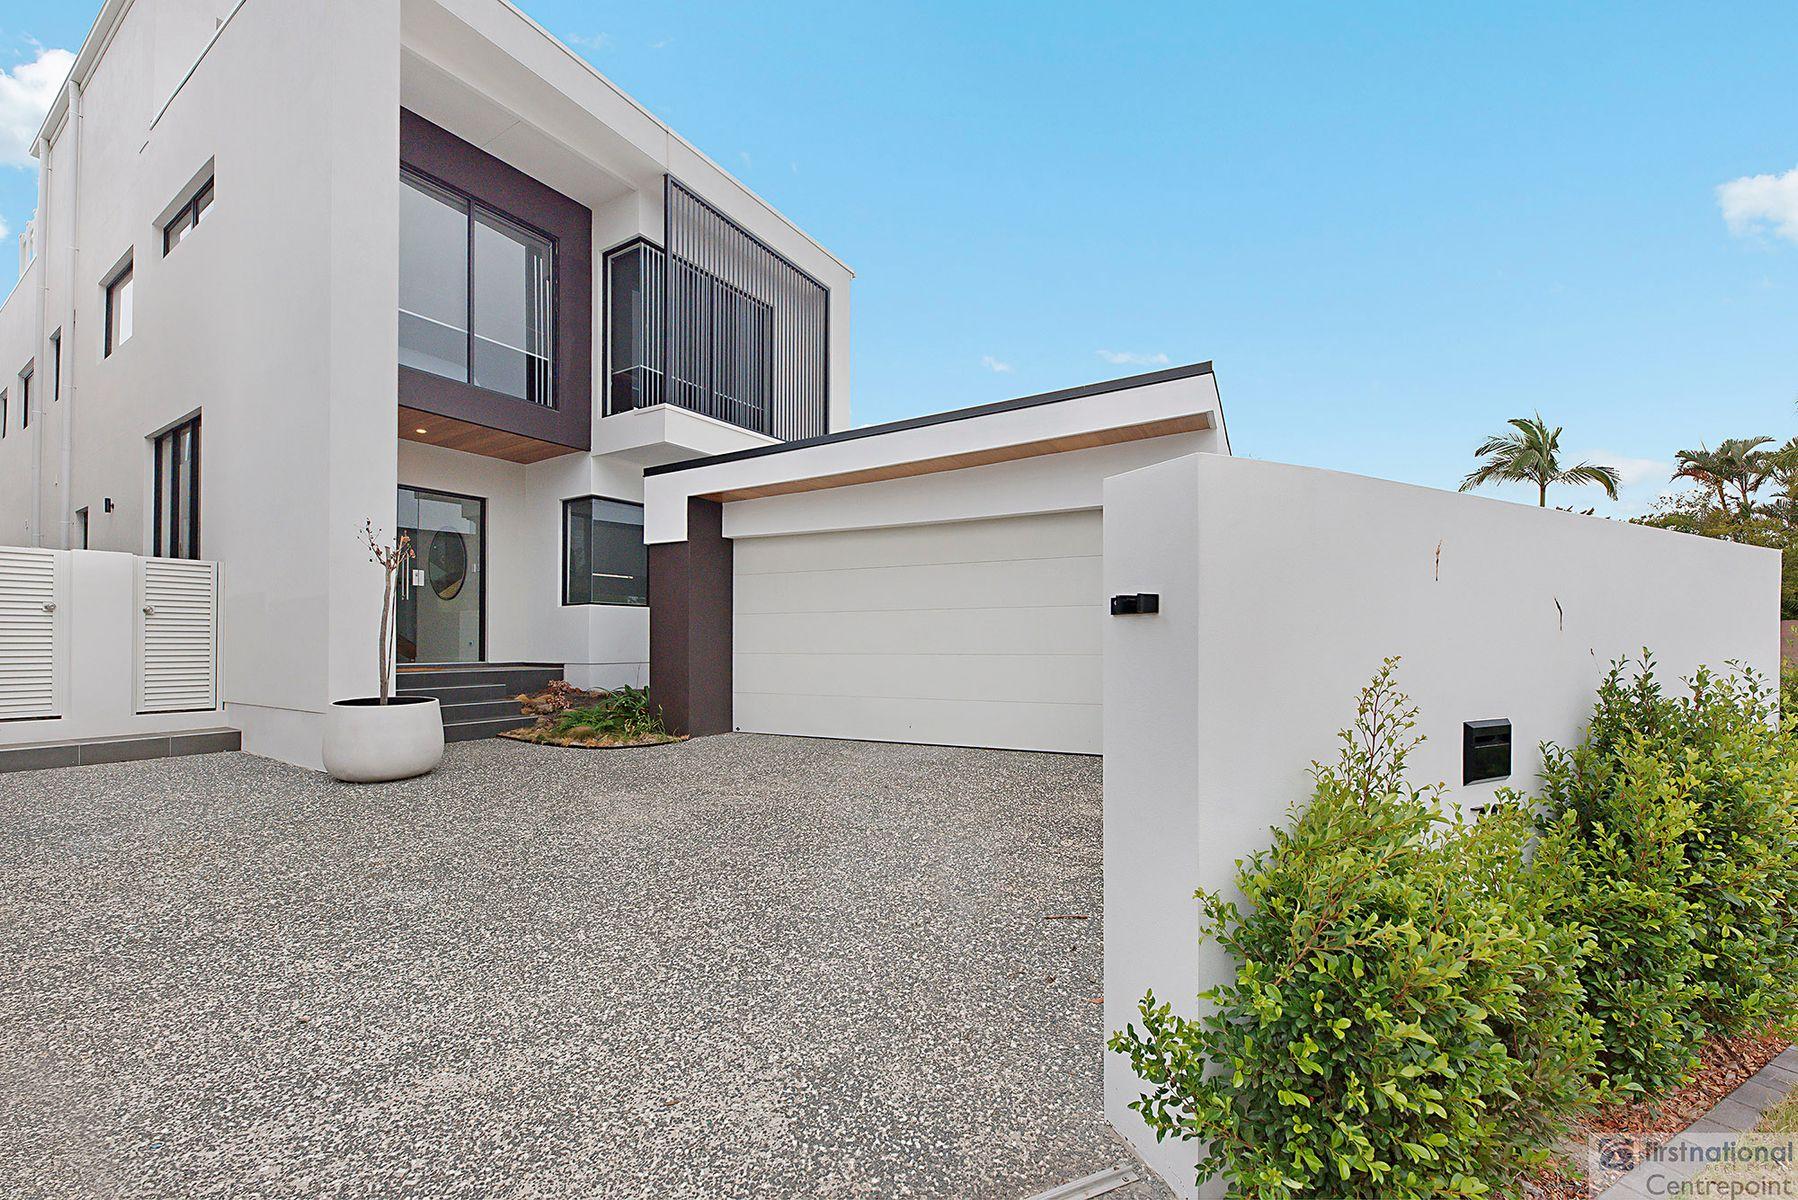 38B Merrimac Boulevard, Broadbeach, QLD 4218